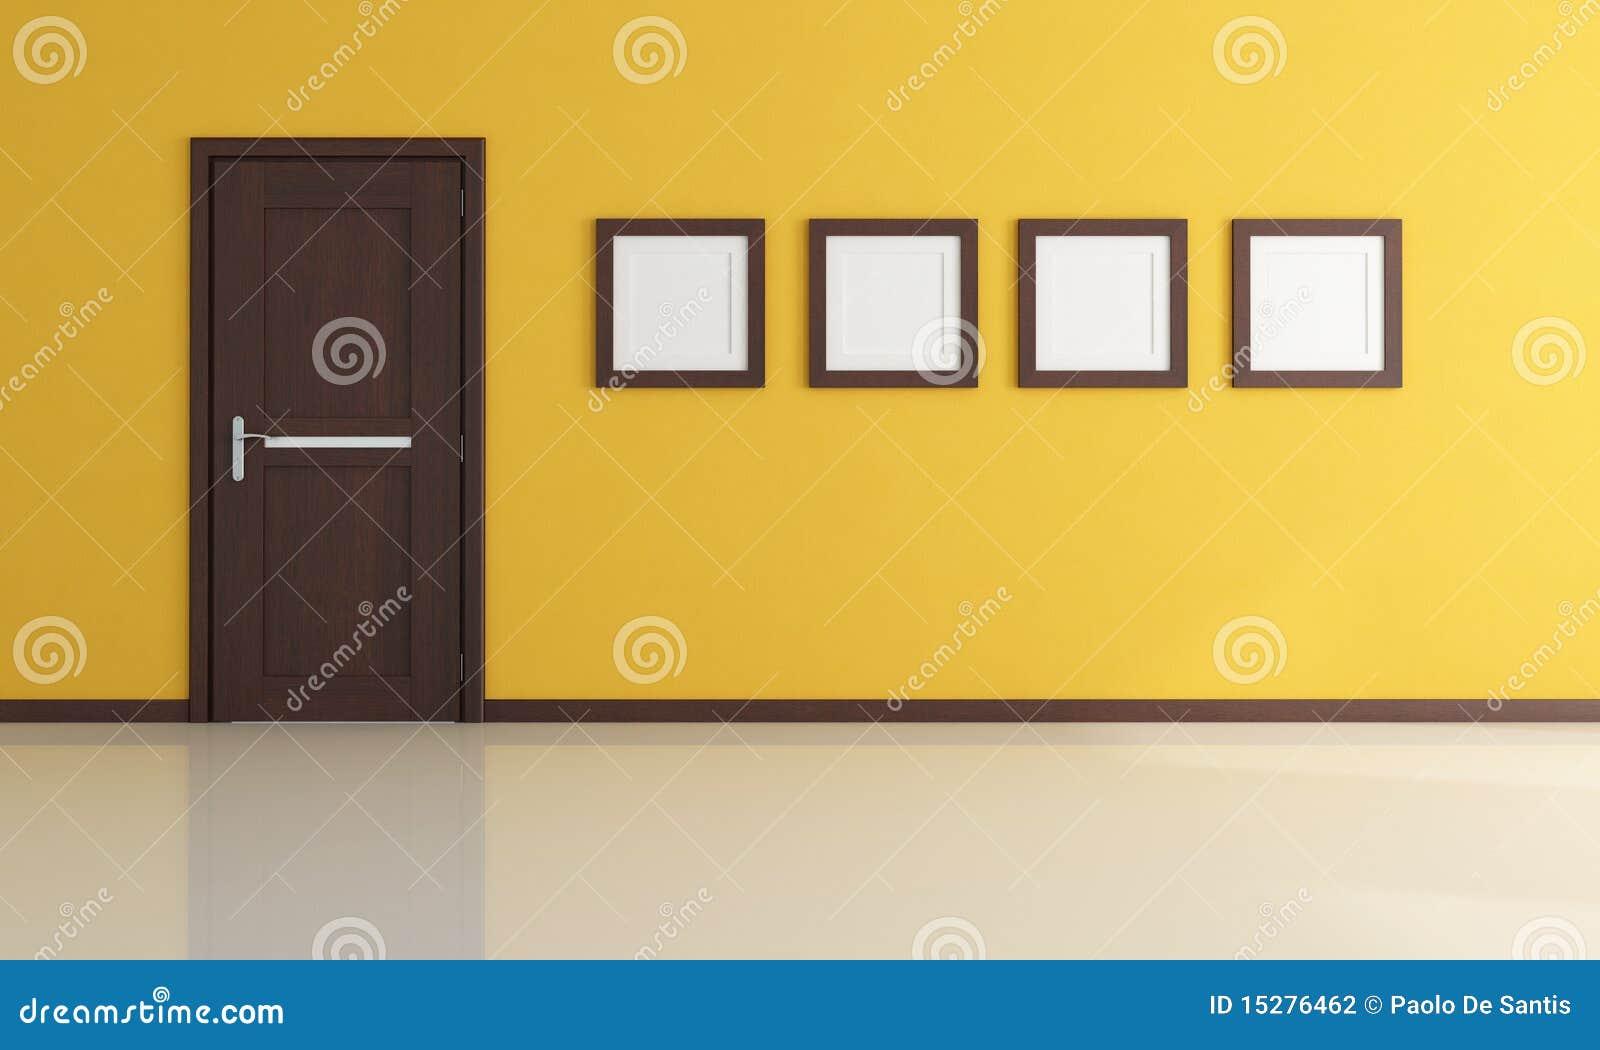 Empty yellow room stock illustration. Illustration of closed ...